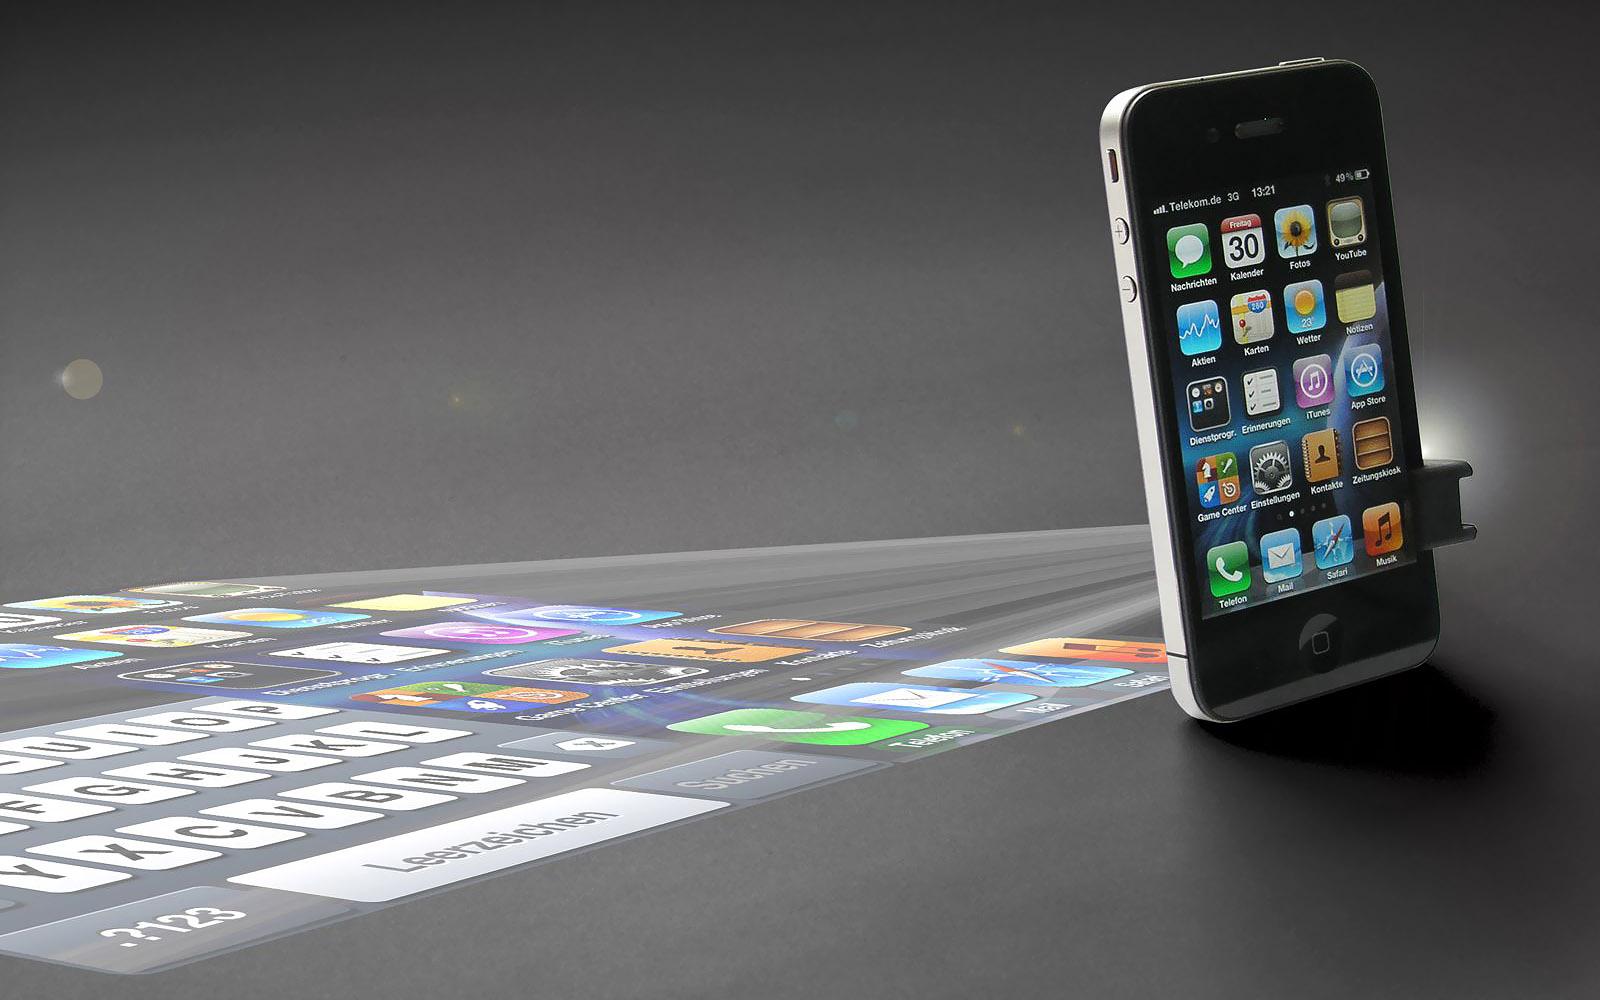 http://3.bp.blogspot.com/-IzB5qYDVymU/UFMOM2BBdEI/AAAAAAAAHpw/X01s78g0VjE/s1600/hd-zwarte-iphone-5-achtergrond-hd-iphone-5-wallpaper.jpg